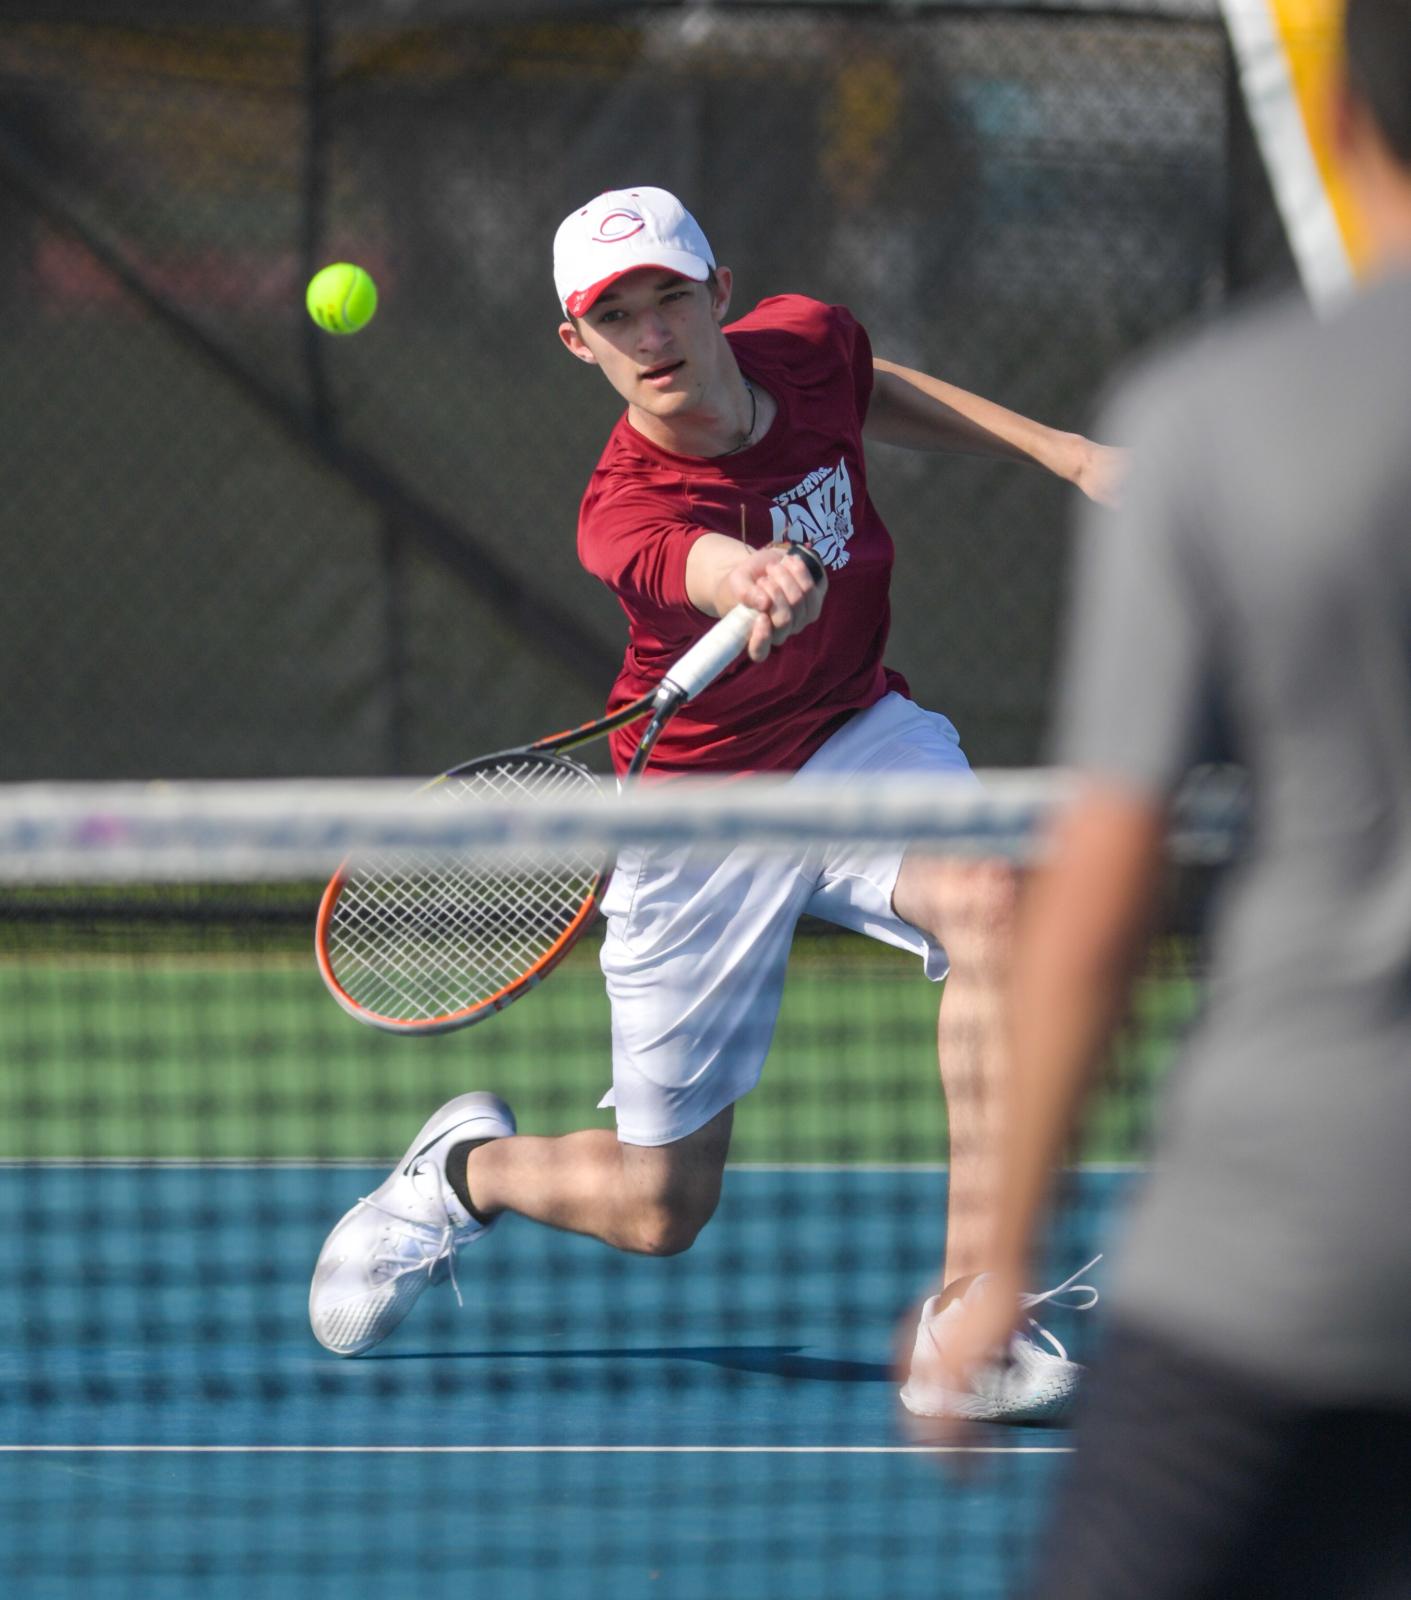 PHOTO GALLERY: North boys tennis team defeats Franklin Heights